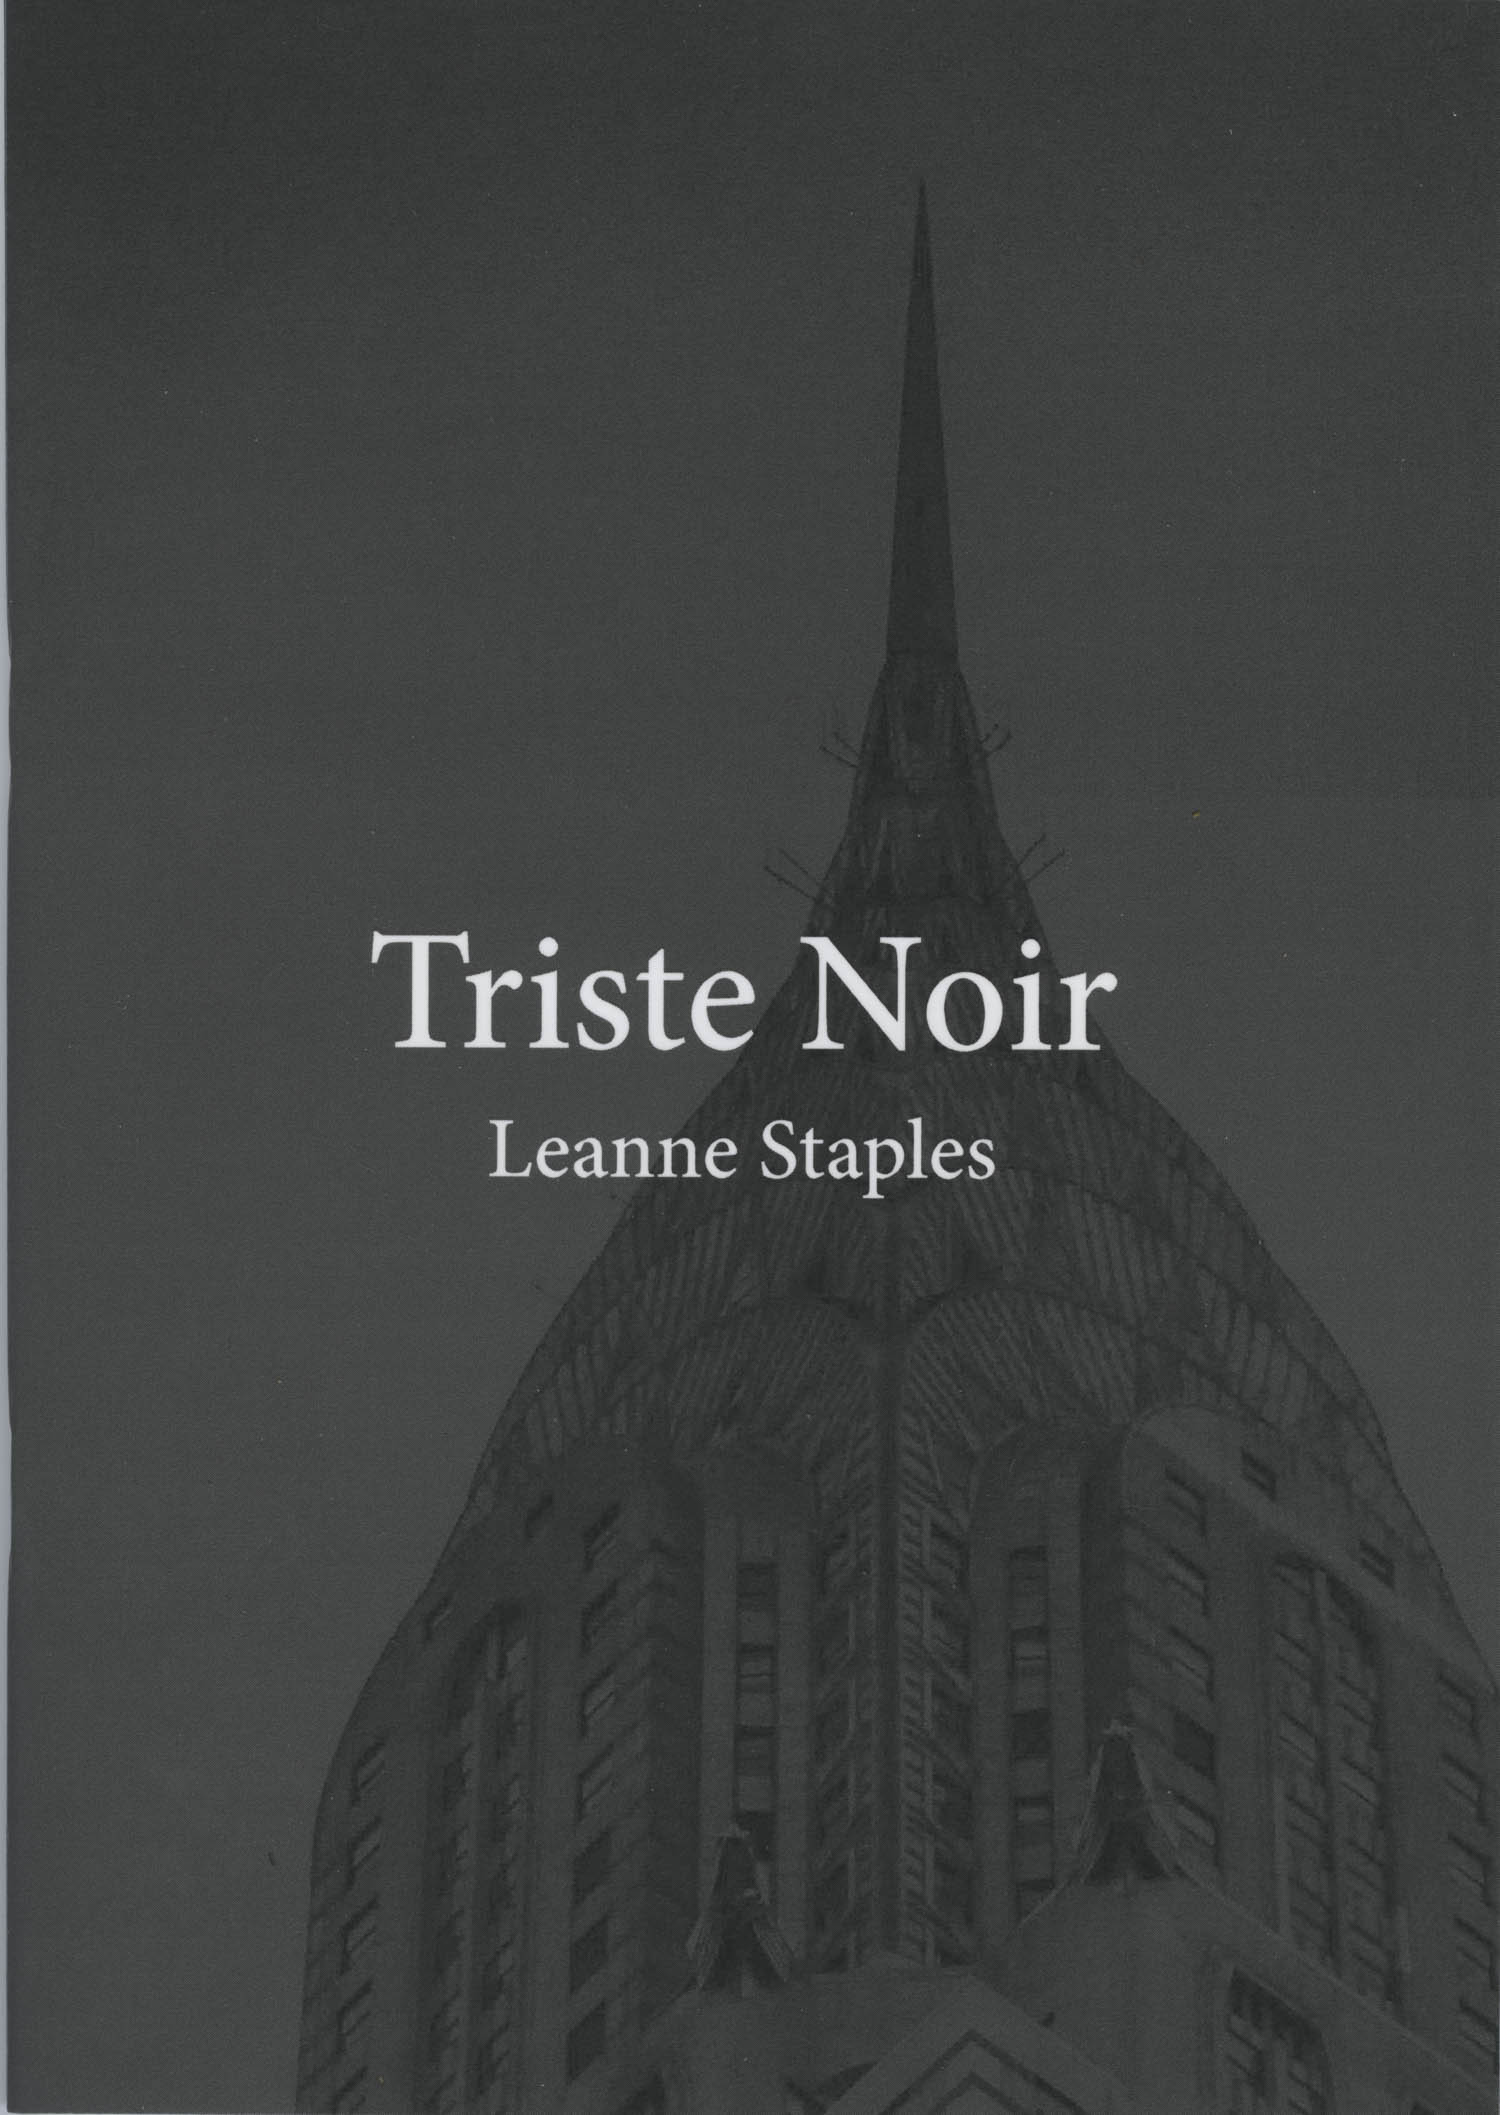 Triste Noir – Limited Edition Photo Zine by Leanne Staples